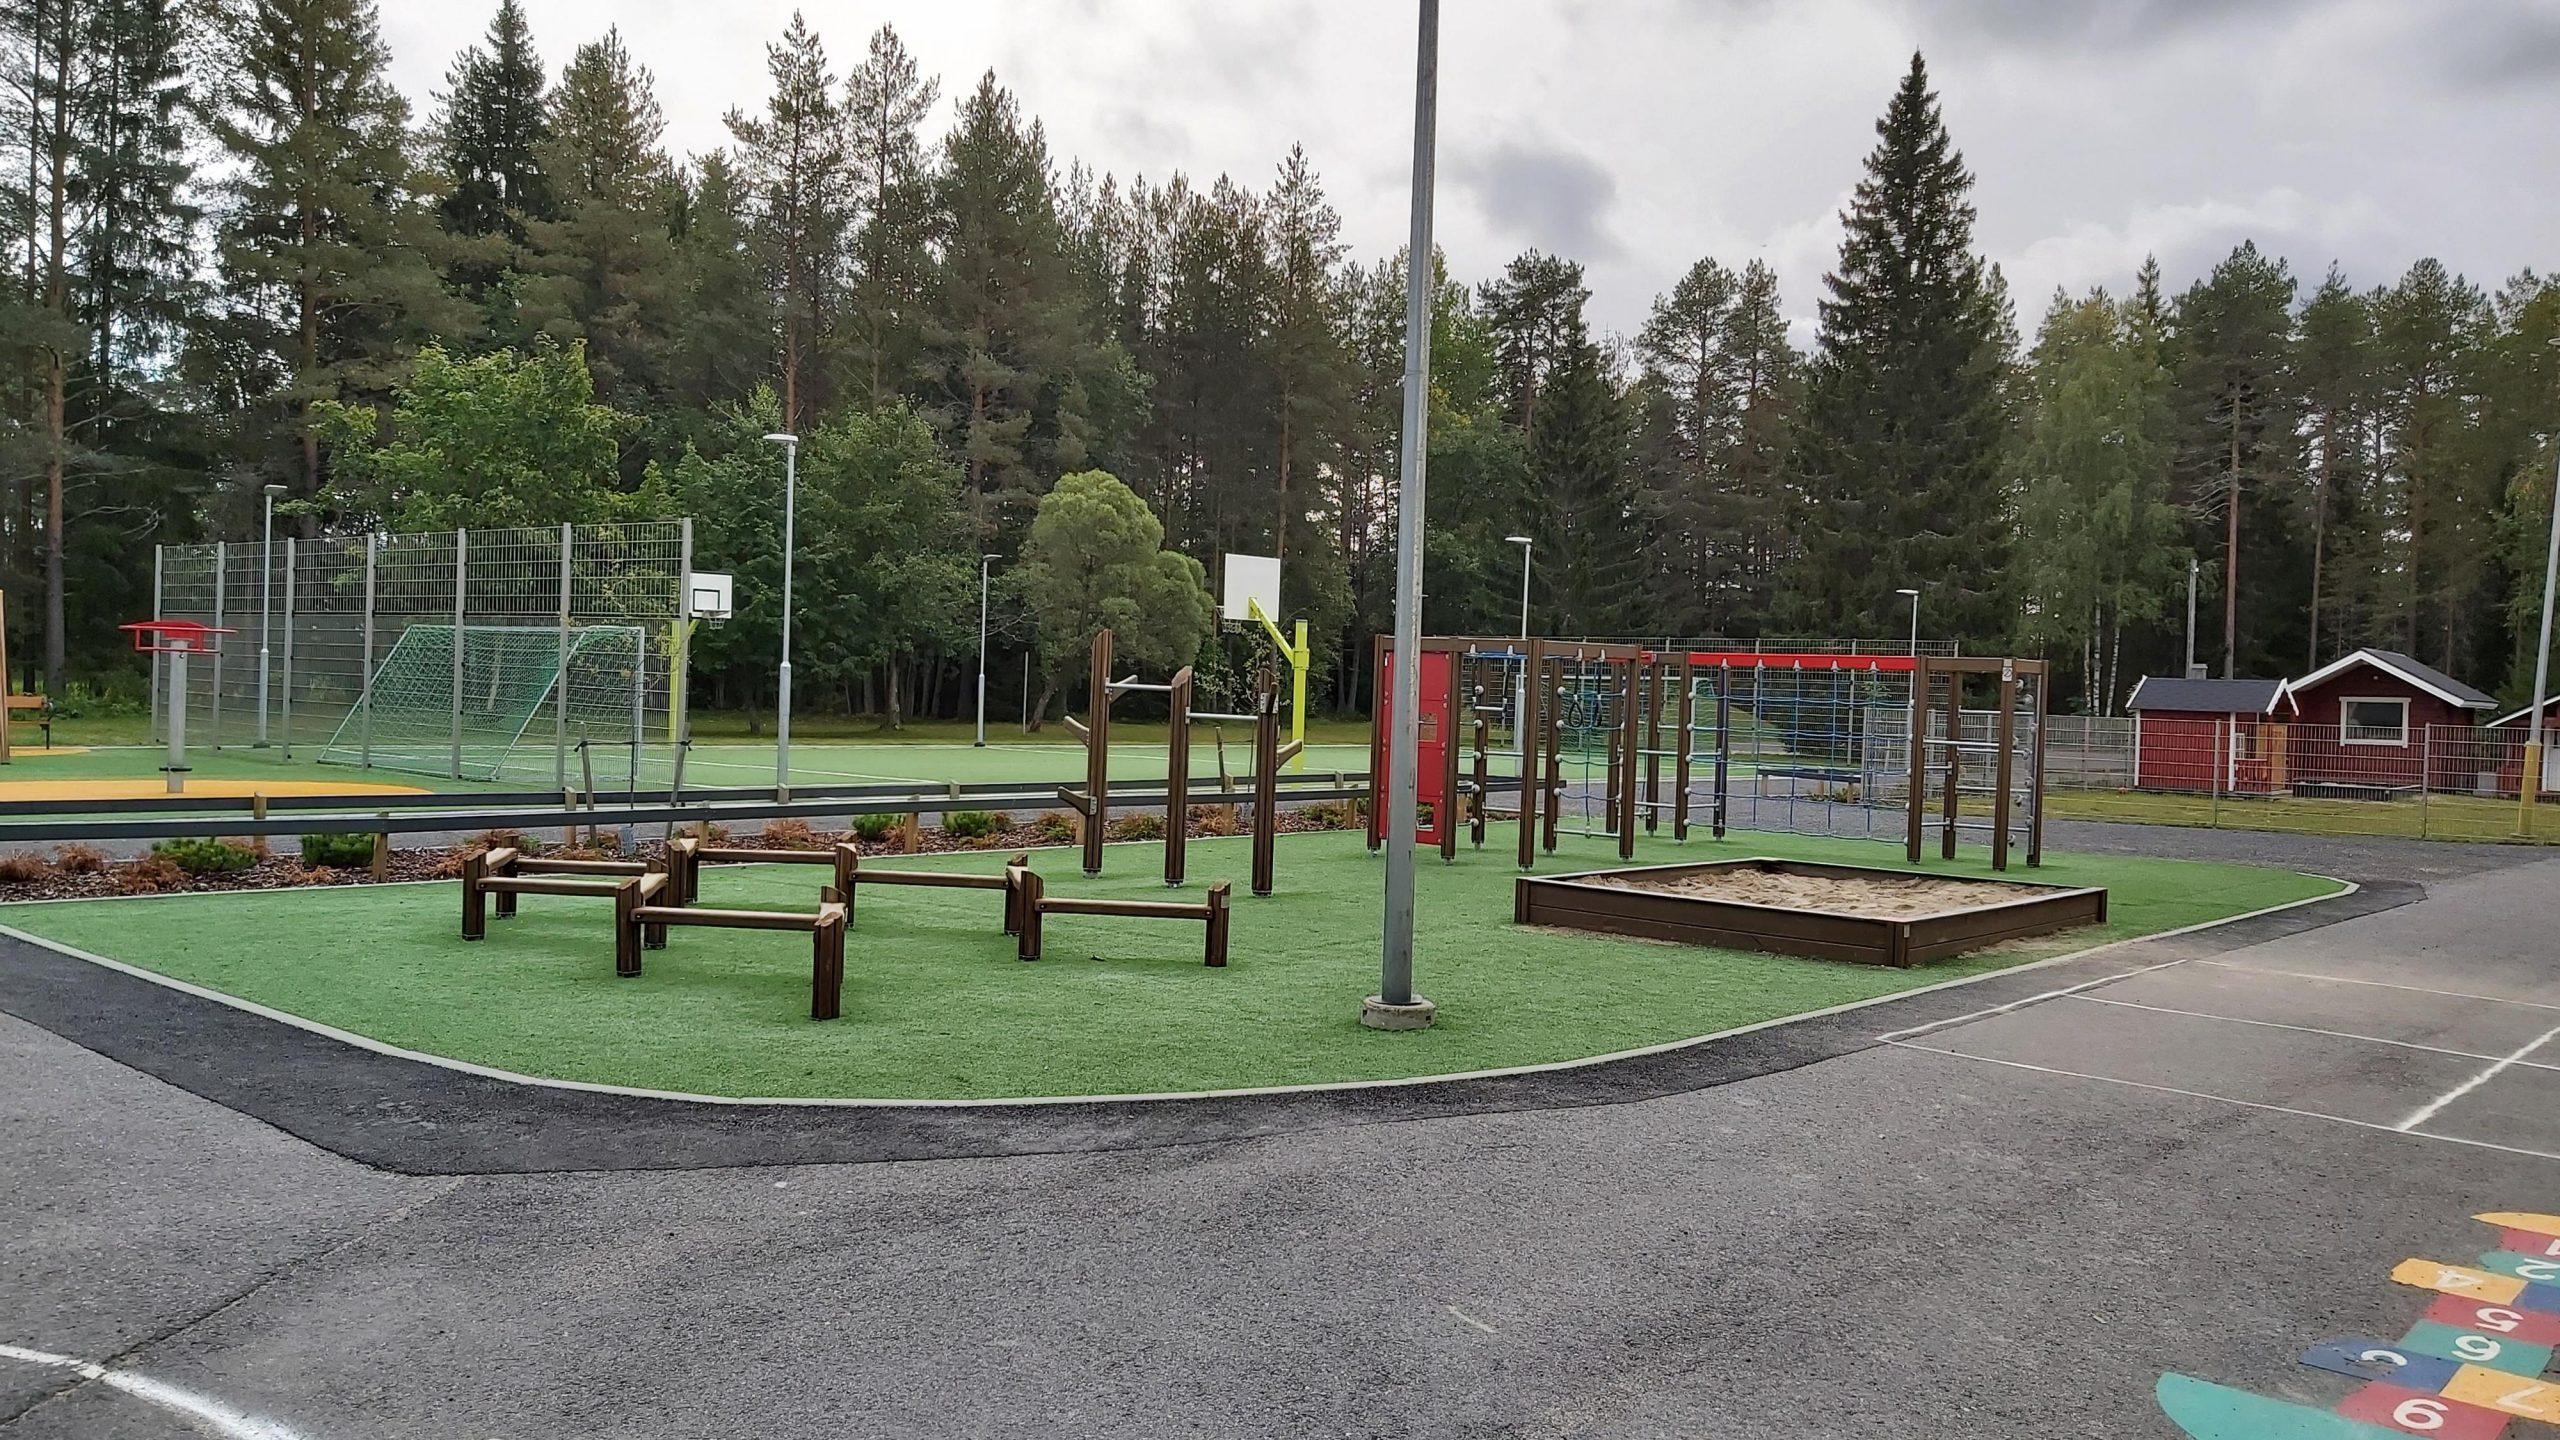 Laitasaaren koulun piha-alue